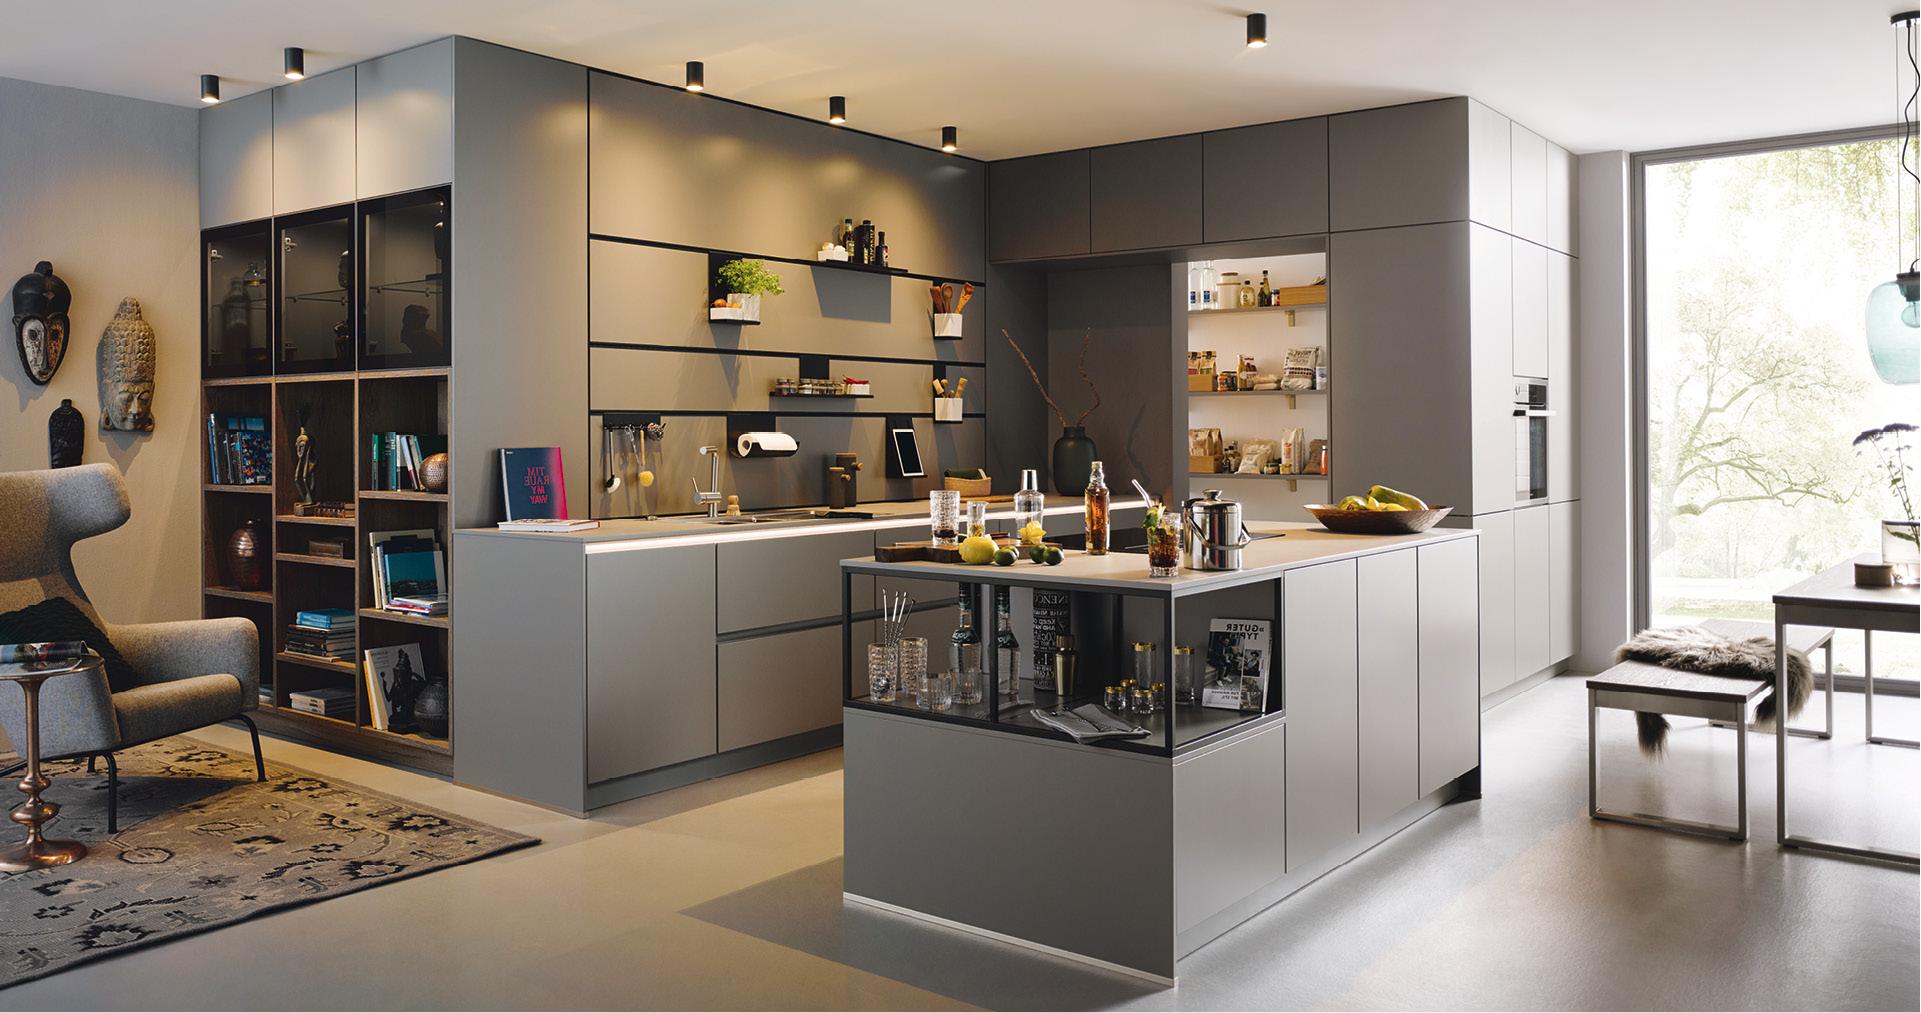 qualit t k chenstudio herter ihr k chenprofi in ulm. Black Bedroom Furniture Sets. Home Design Ideas